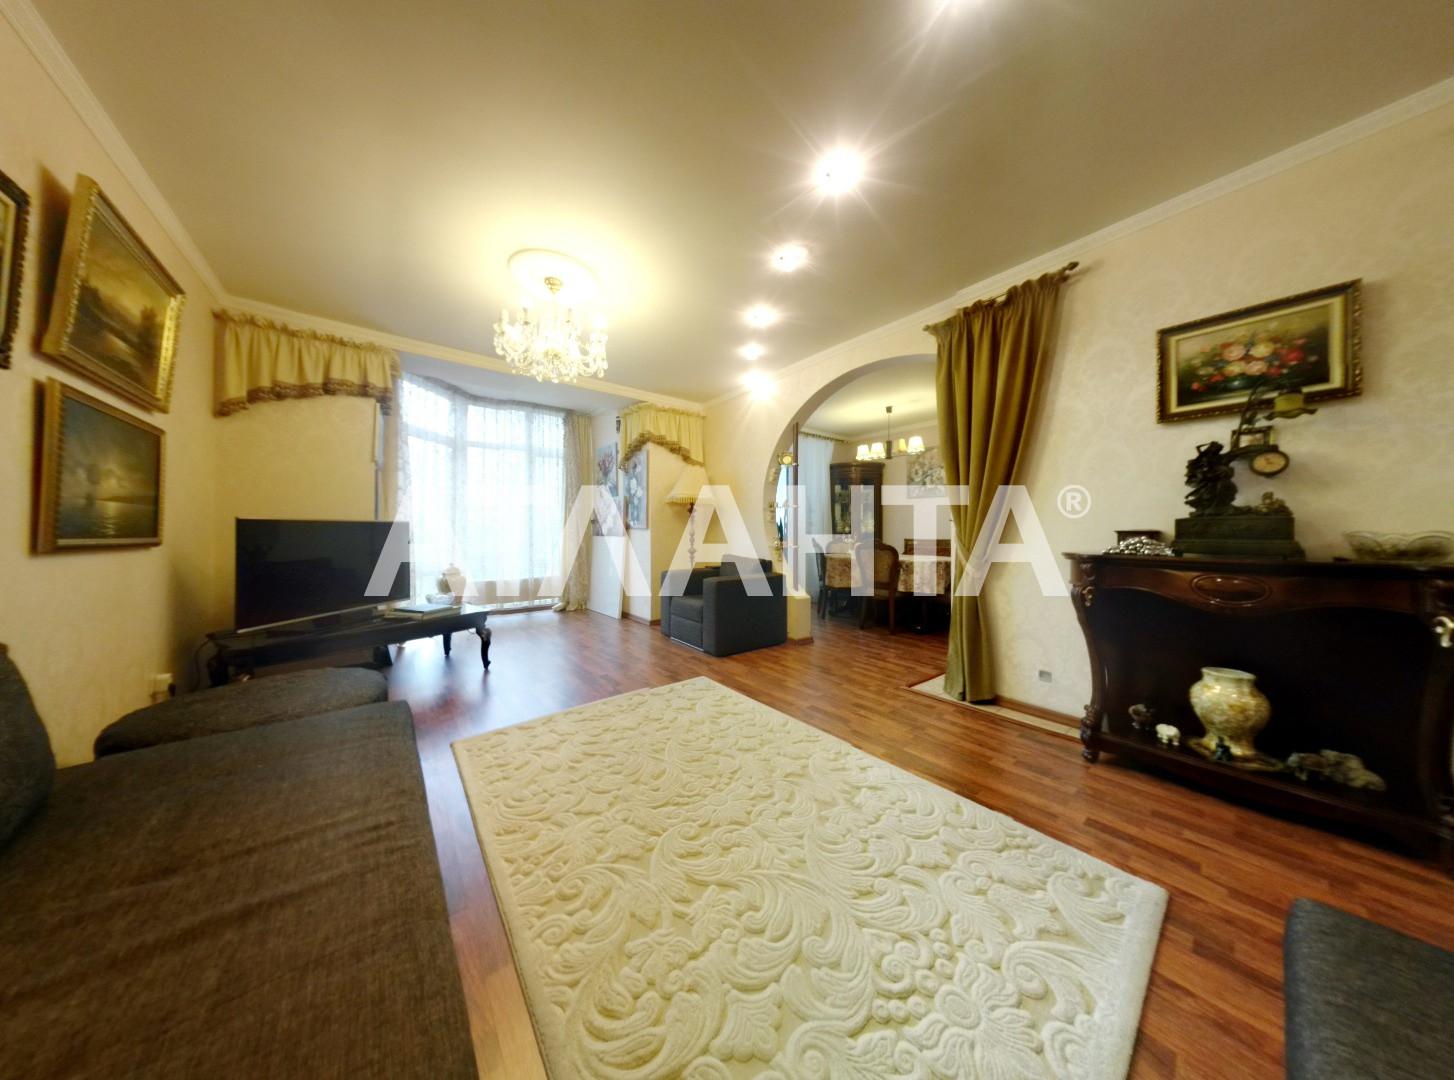 Продается 3-комнатная Квартира на ул. Ул. Ломоносова — 139 600 у.е. (фото №3)